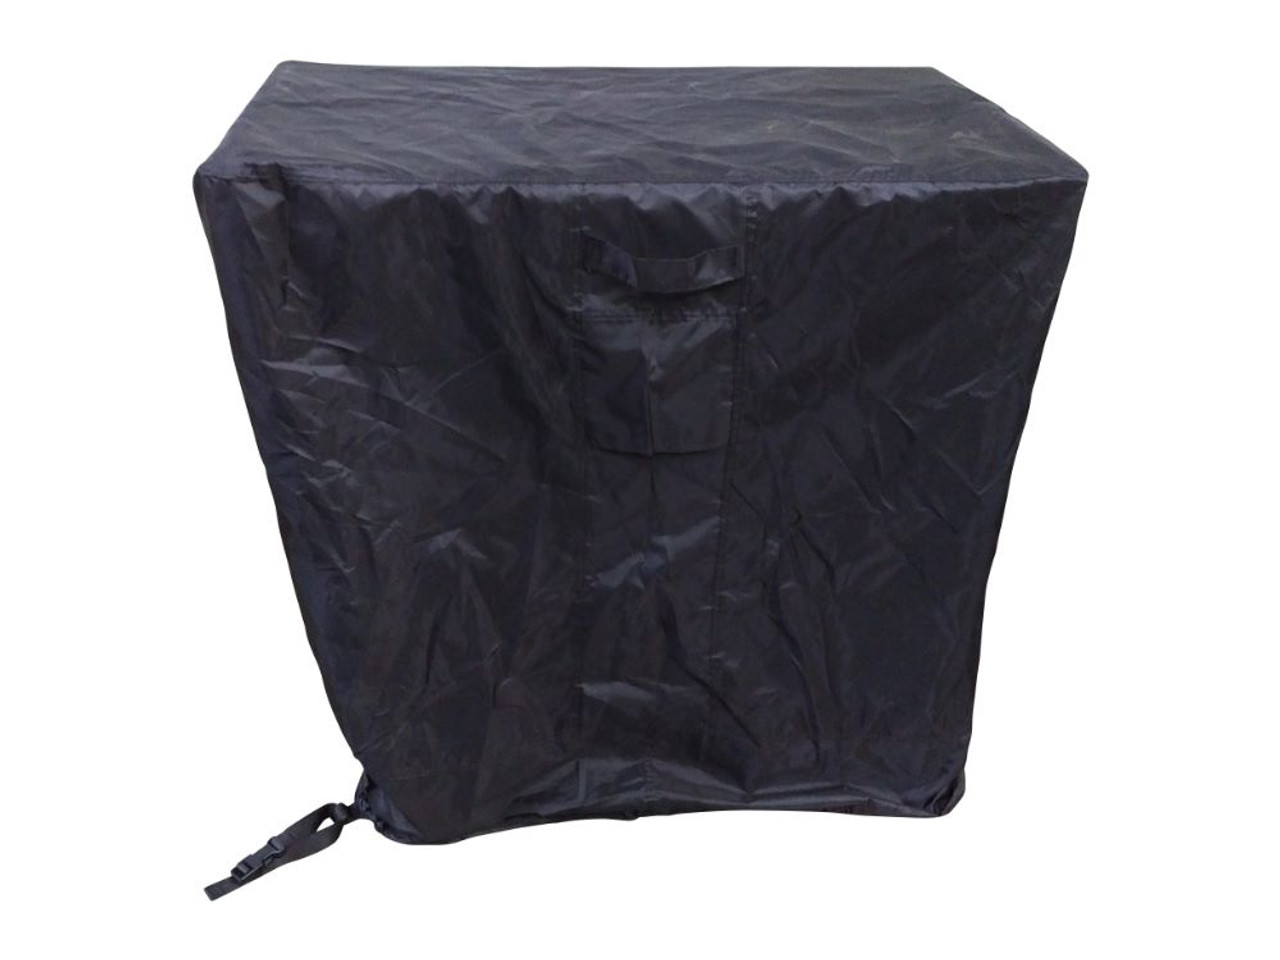 Table Saw Cover, Large, 66Wx36Dx36H (Advantage #51175)